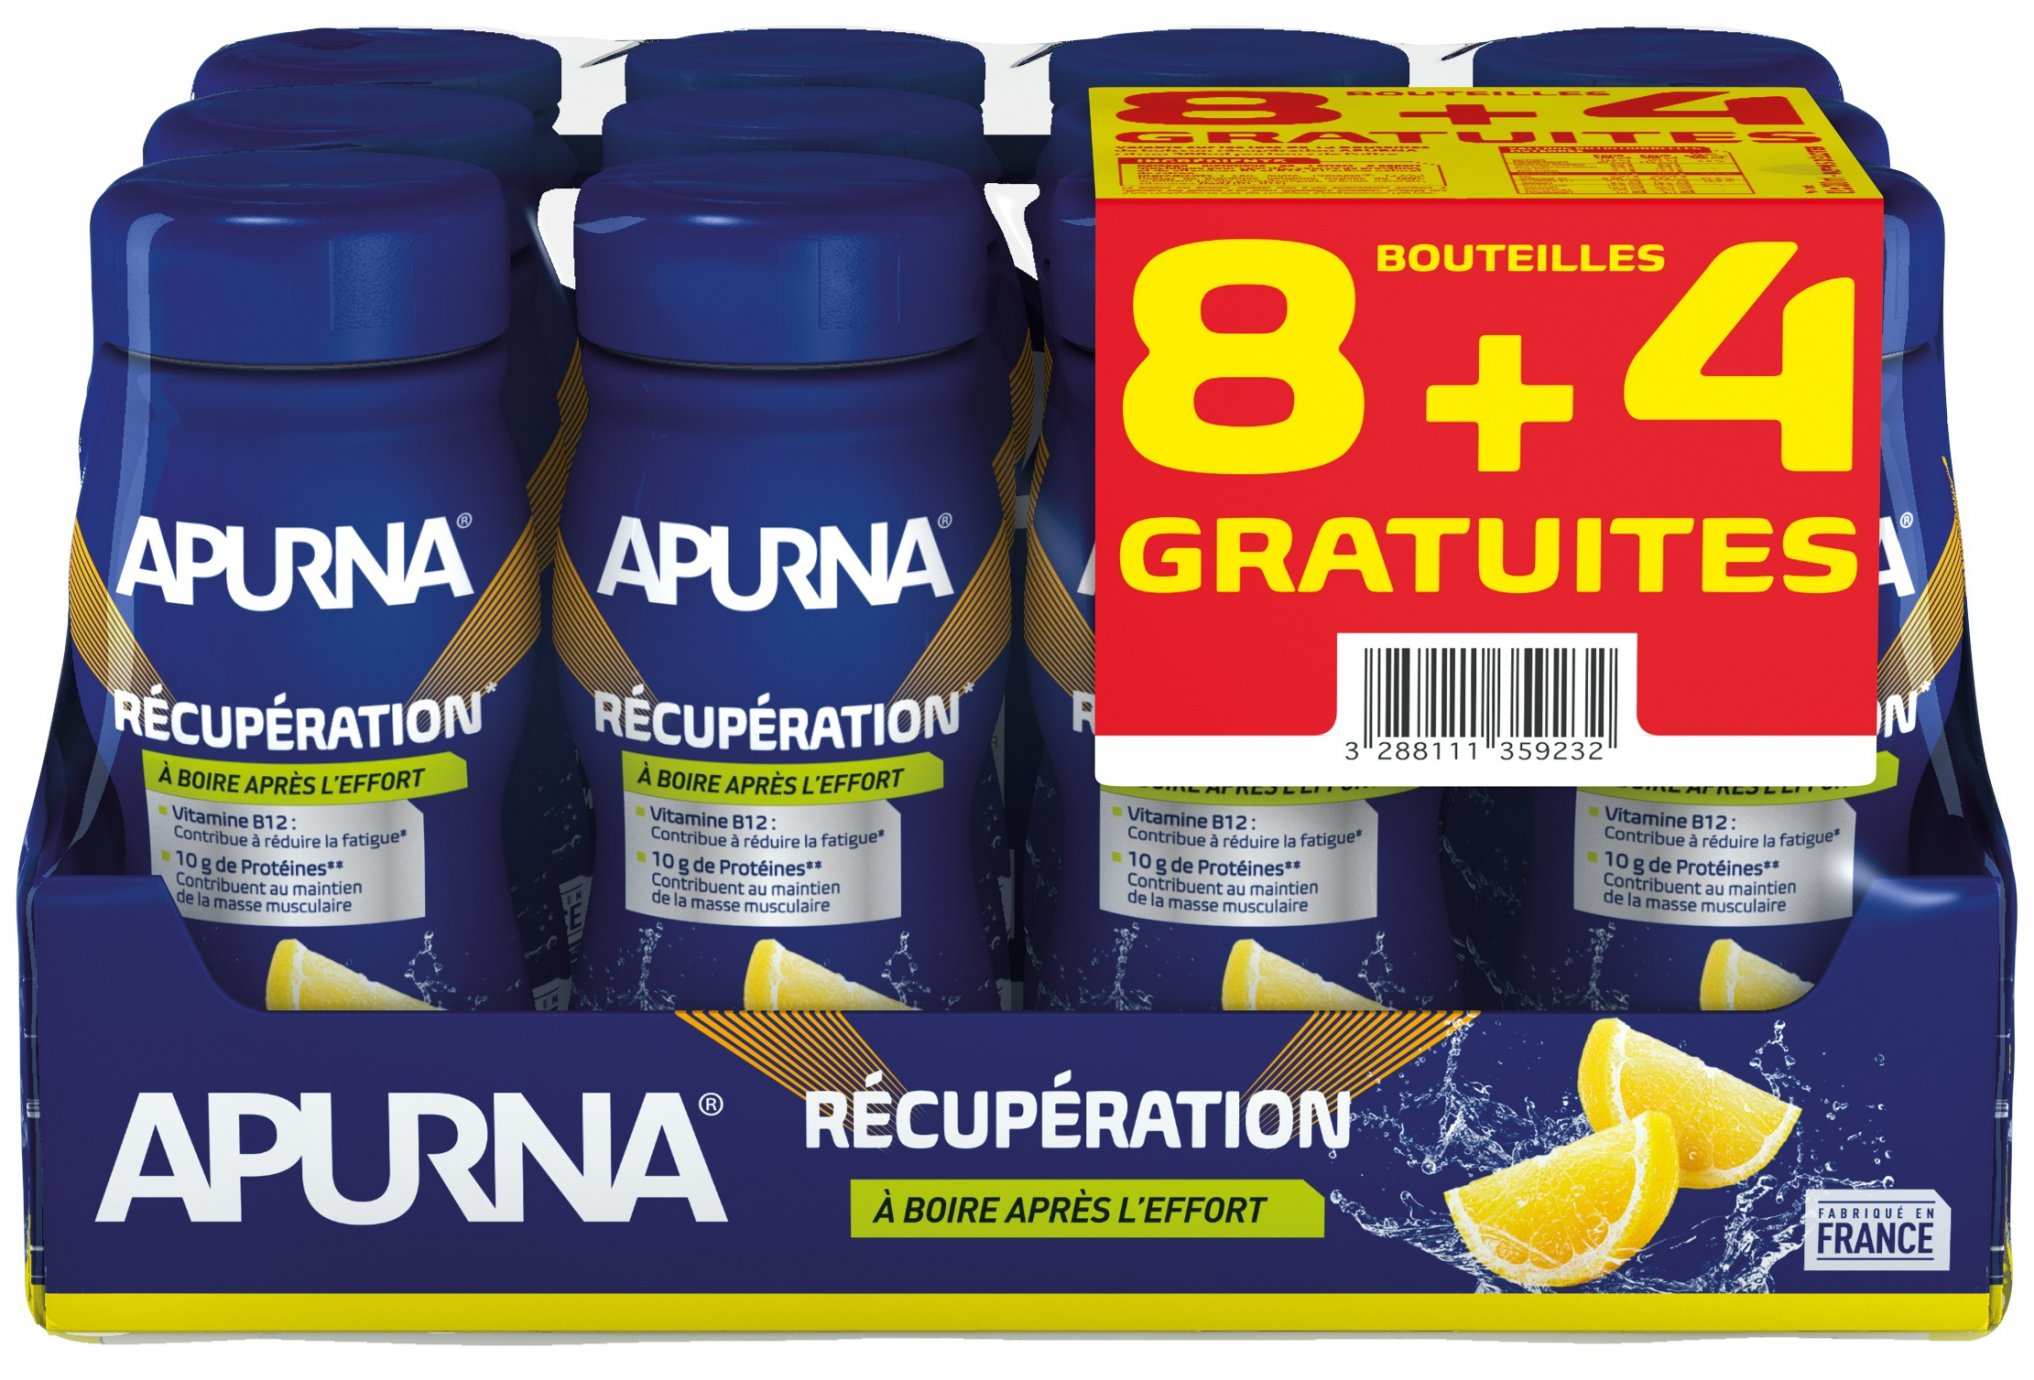 Apurna Pack 8+4 Bebida recuperación-Limón Diététique Protéines / récupération